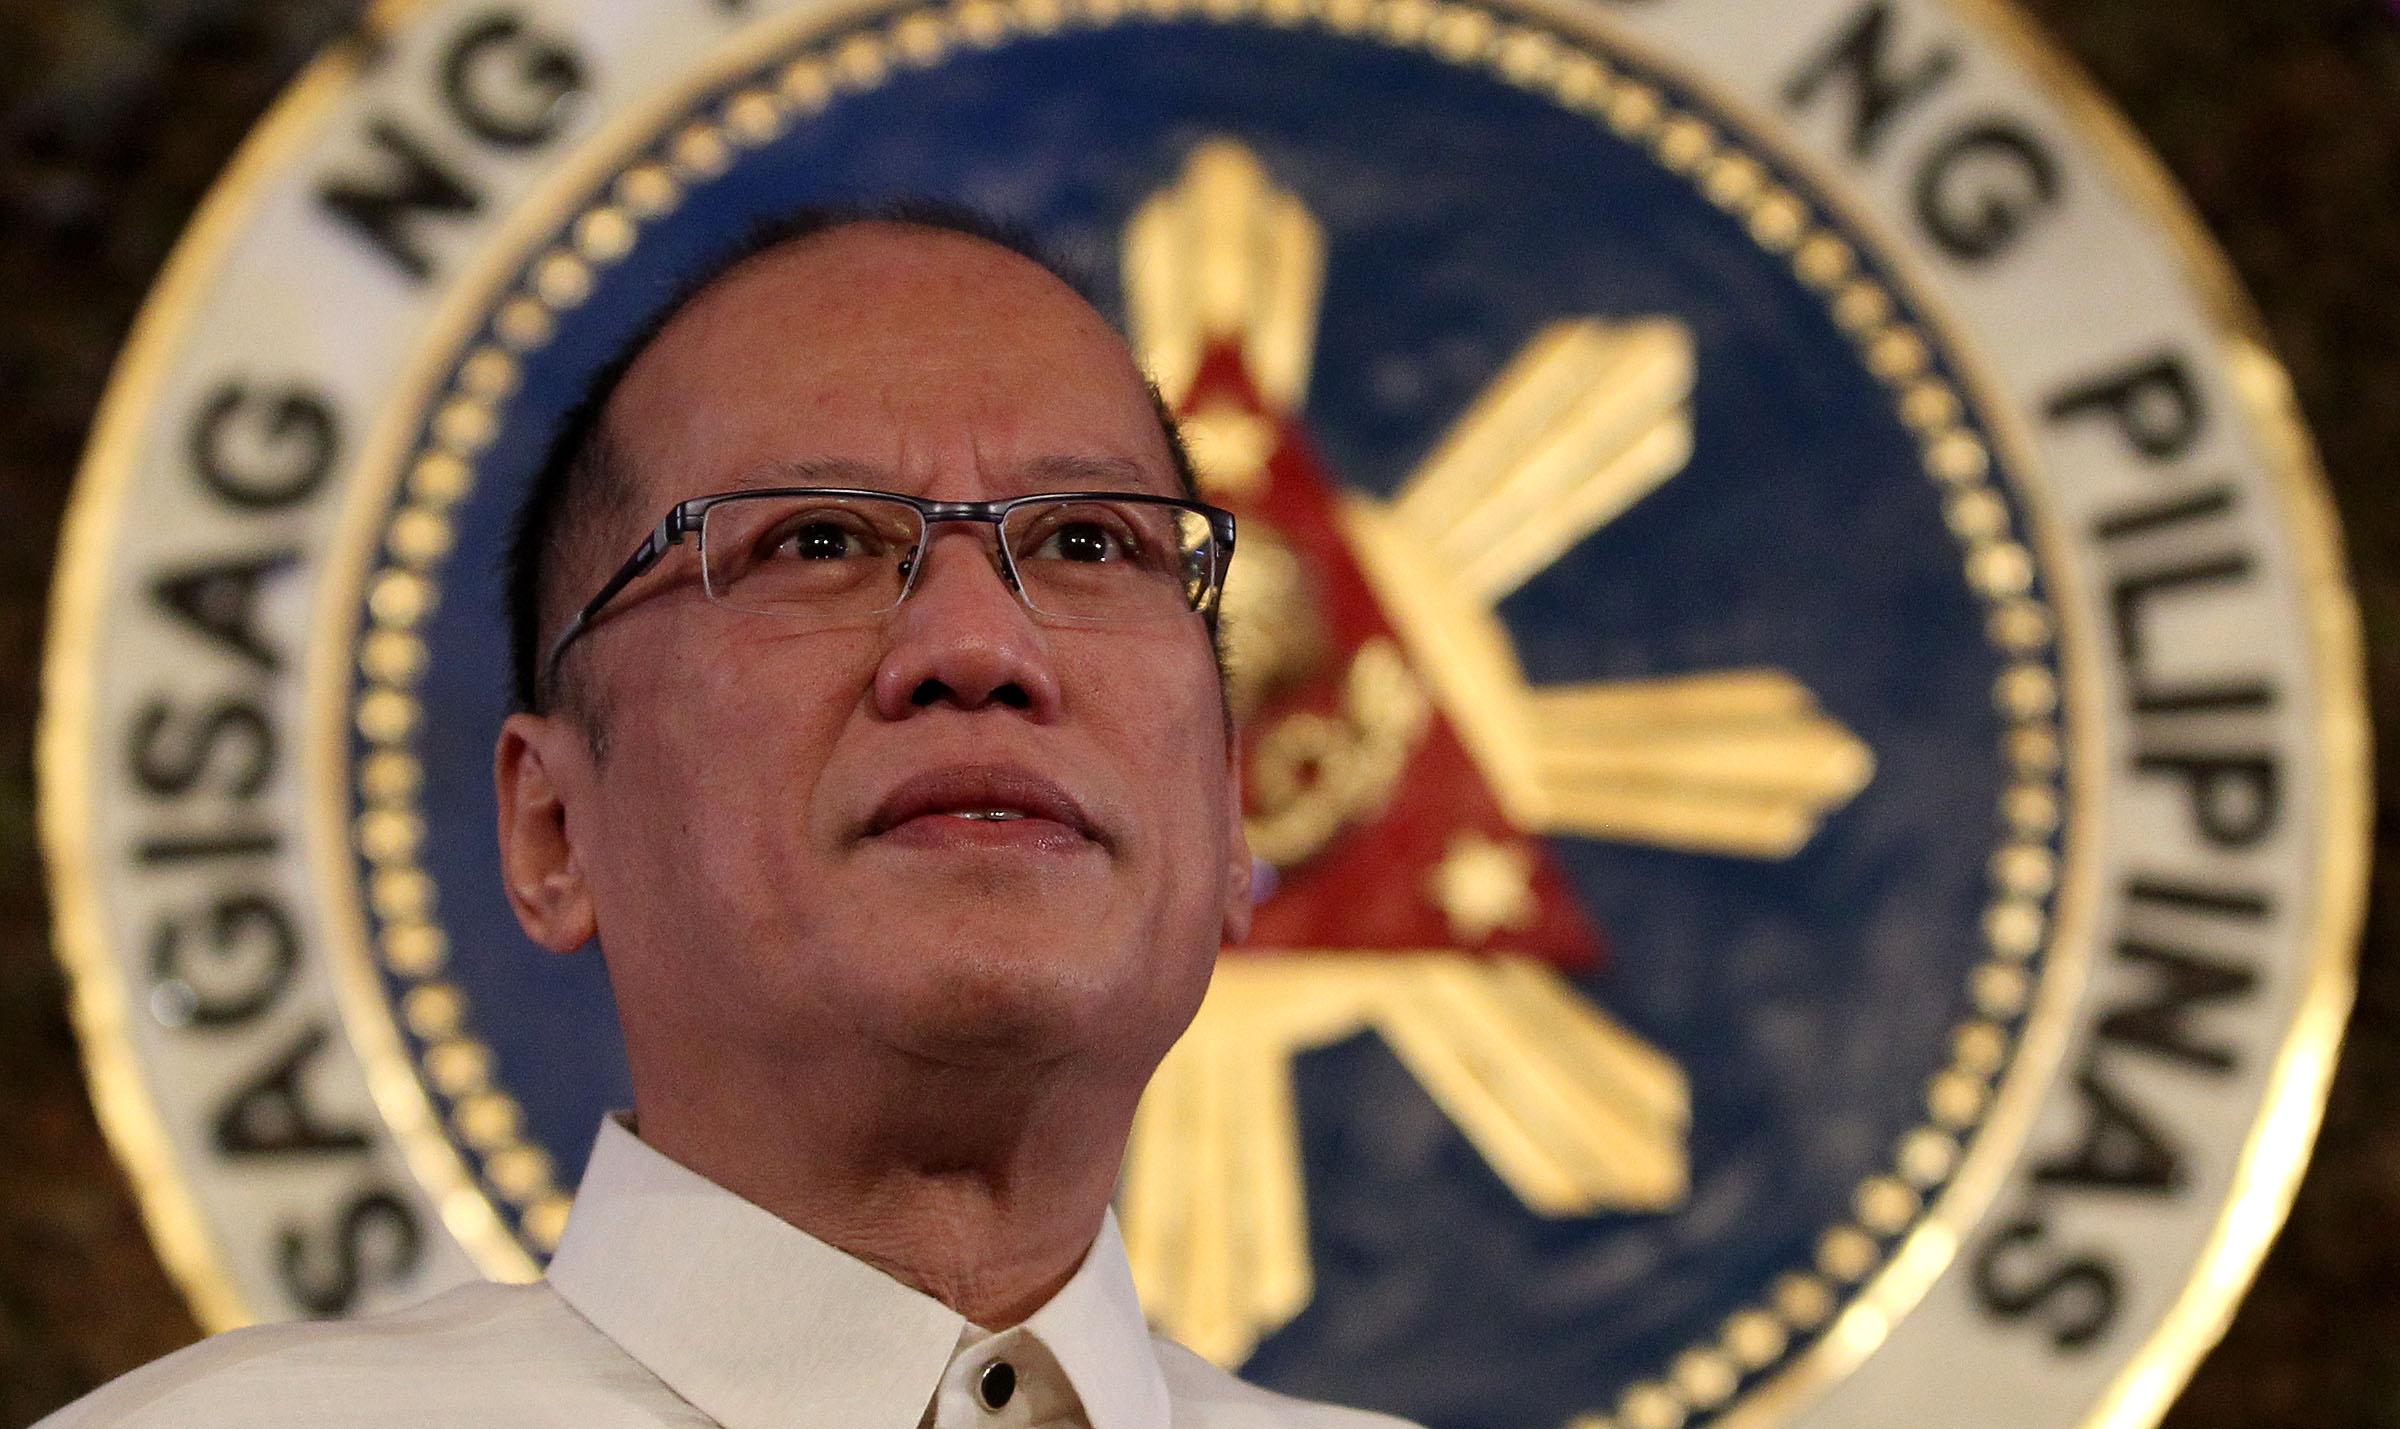 larry gadon, <b> Larry Gadon really slandered and prayed for Noynoy Aquino&#8217;s death </b>